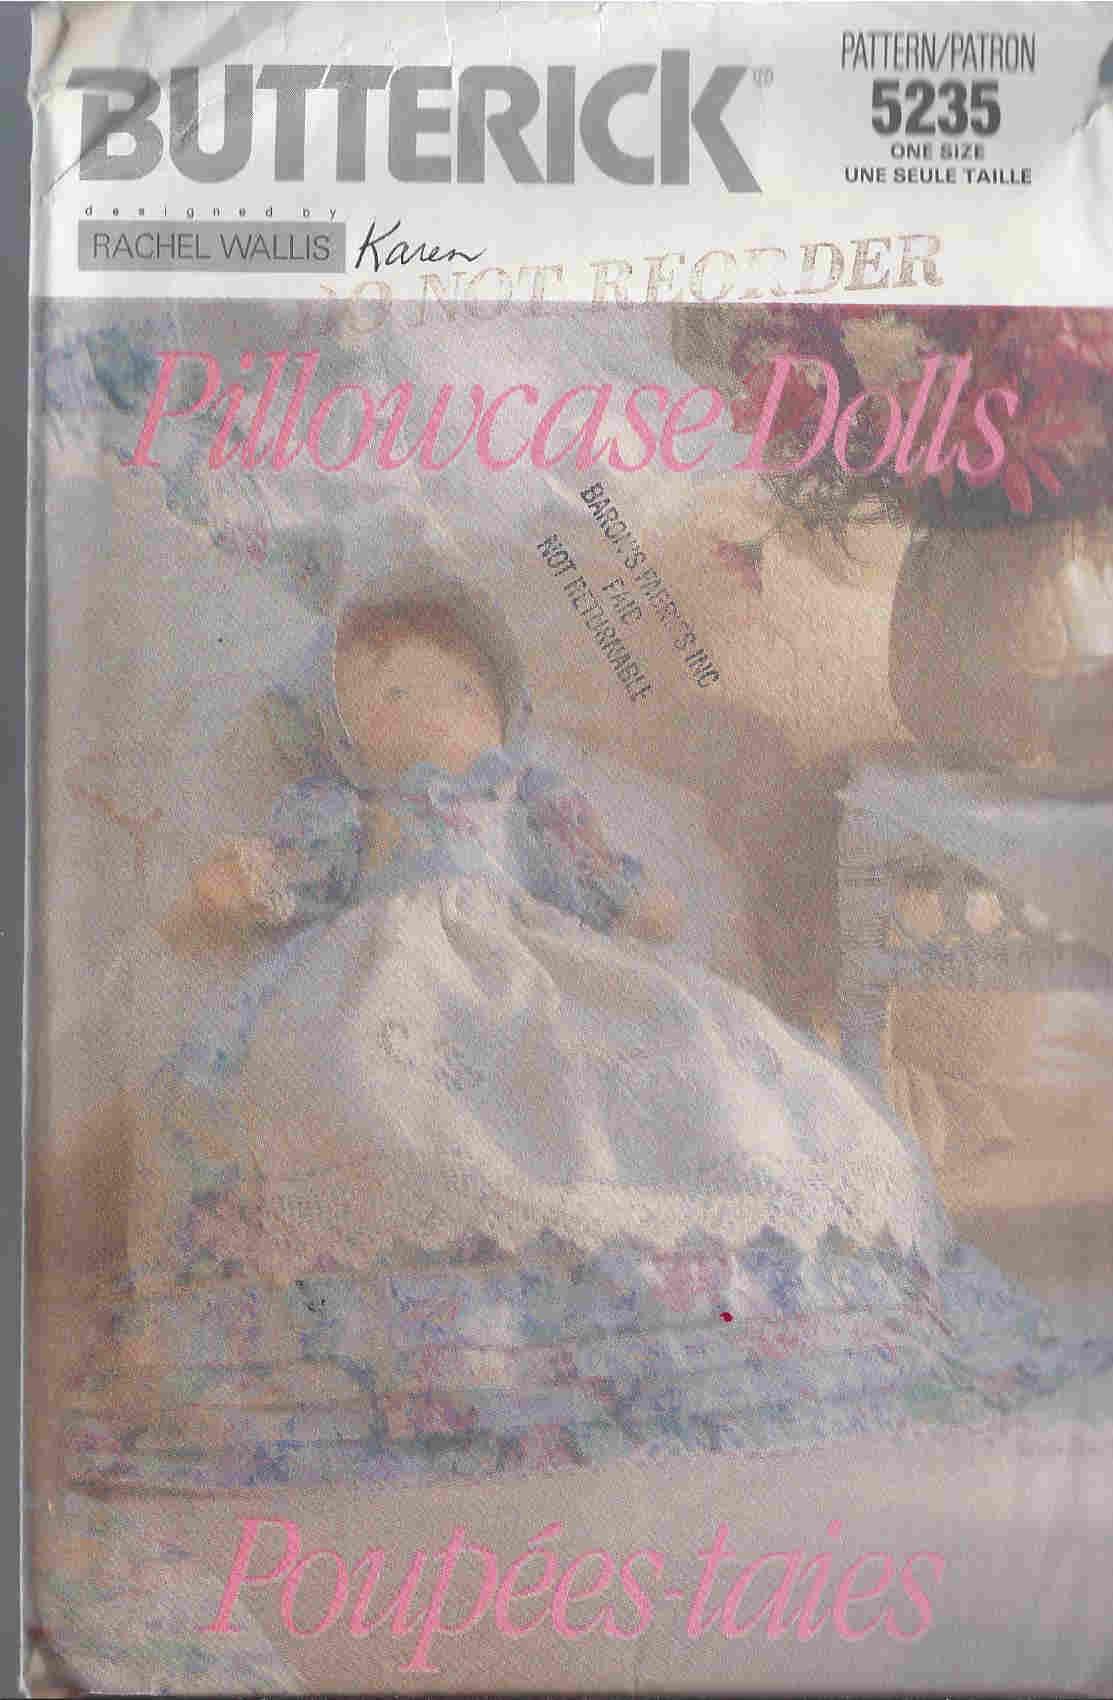 pillowcase dolls sewing pattern